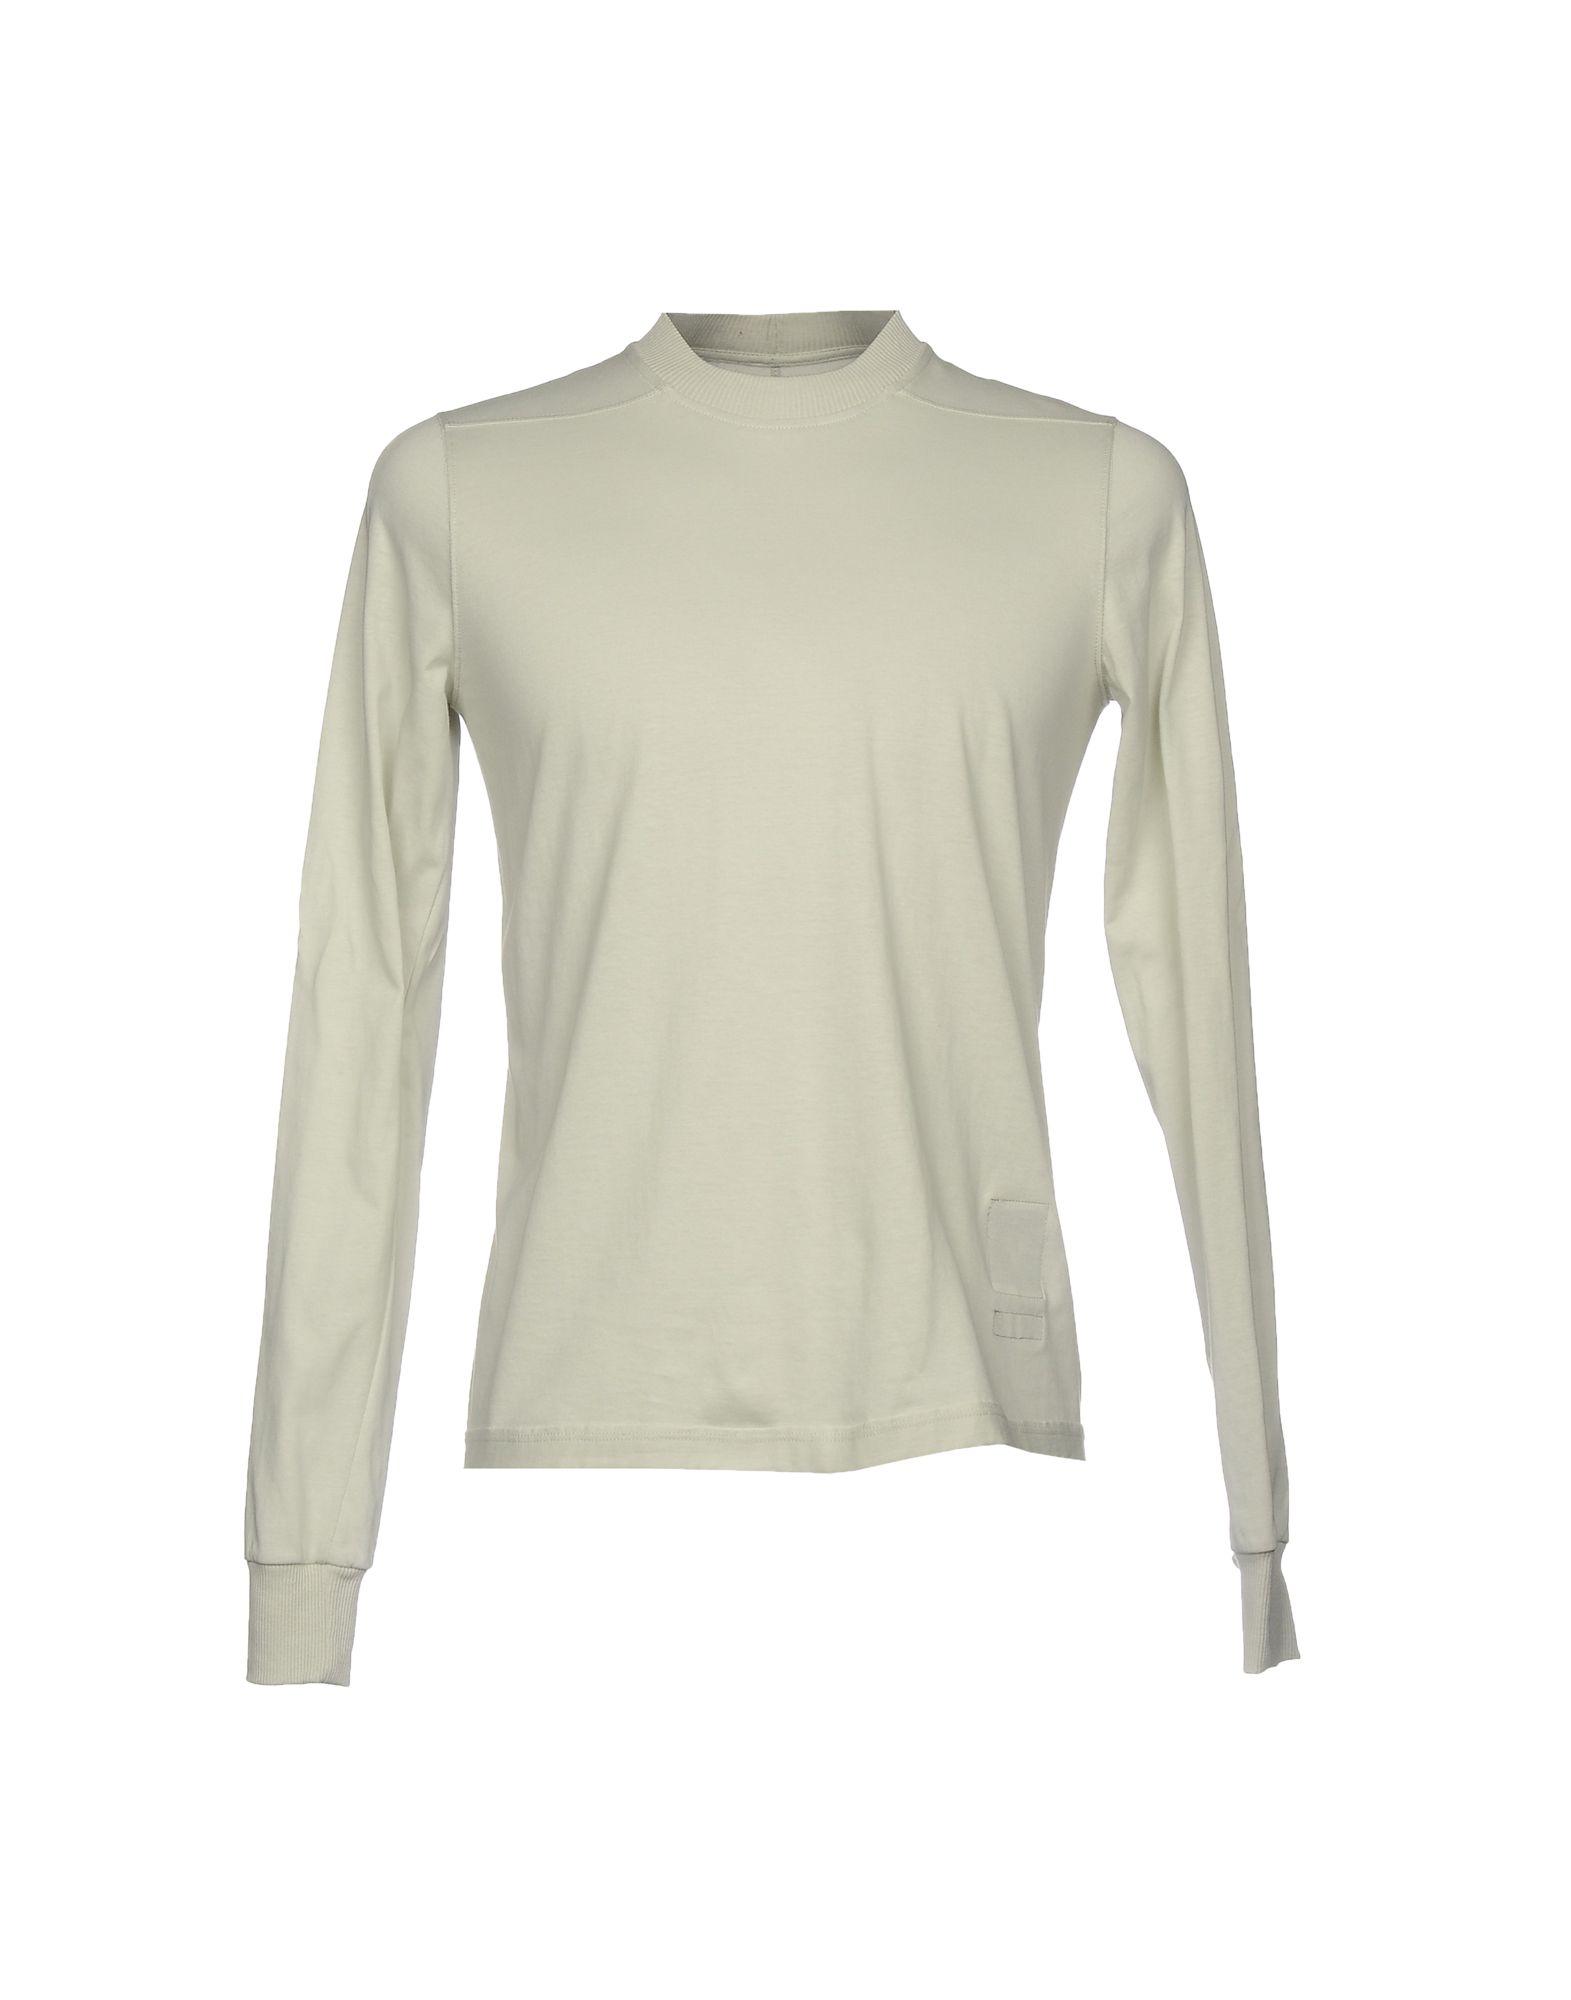 DRKSHDW by RICK OWENS Футболка пуловер quelle rick cardona by heine 91330